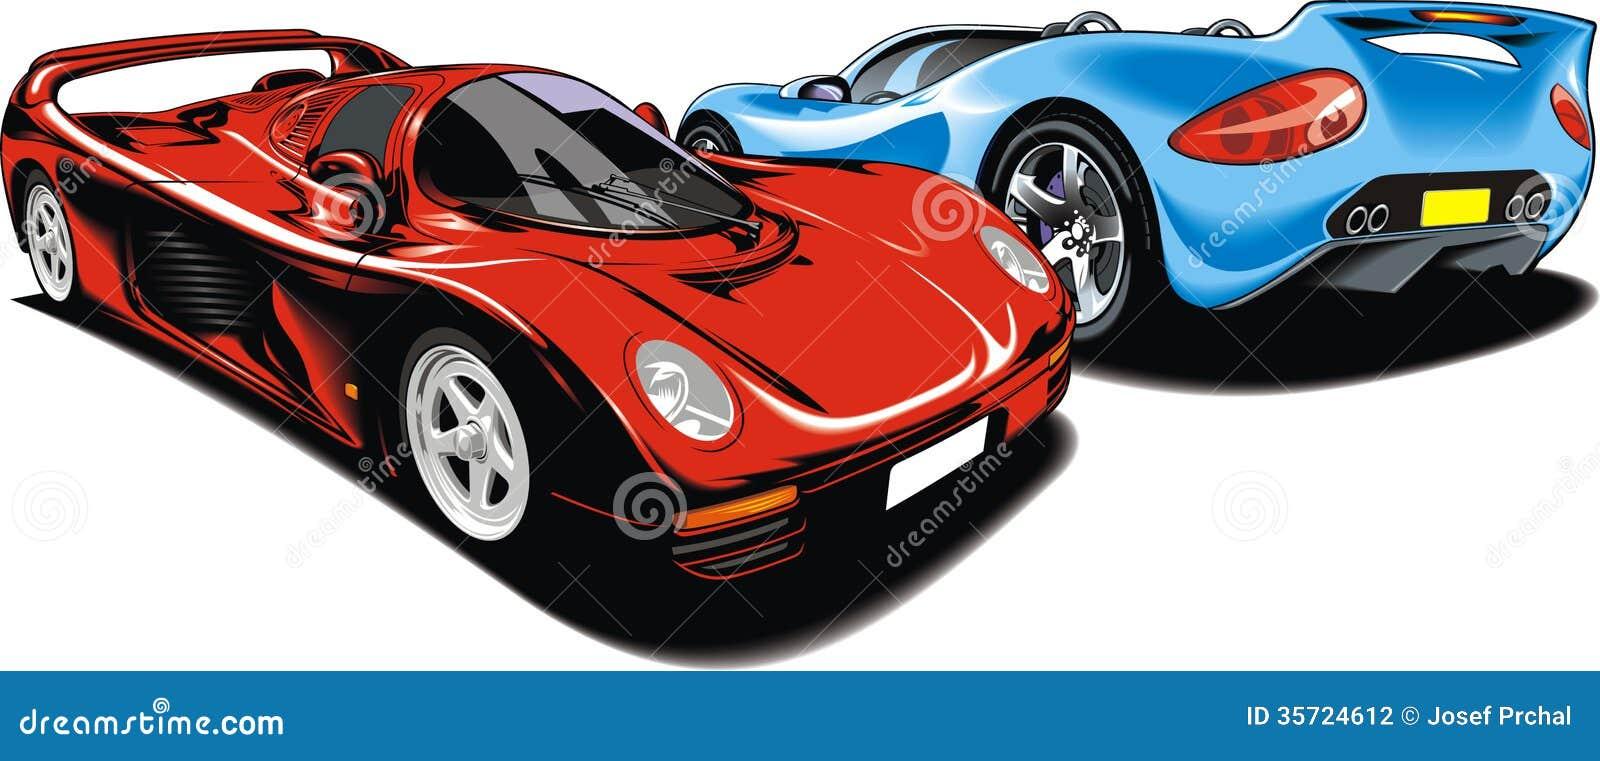 Design my car - Background Design